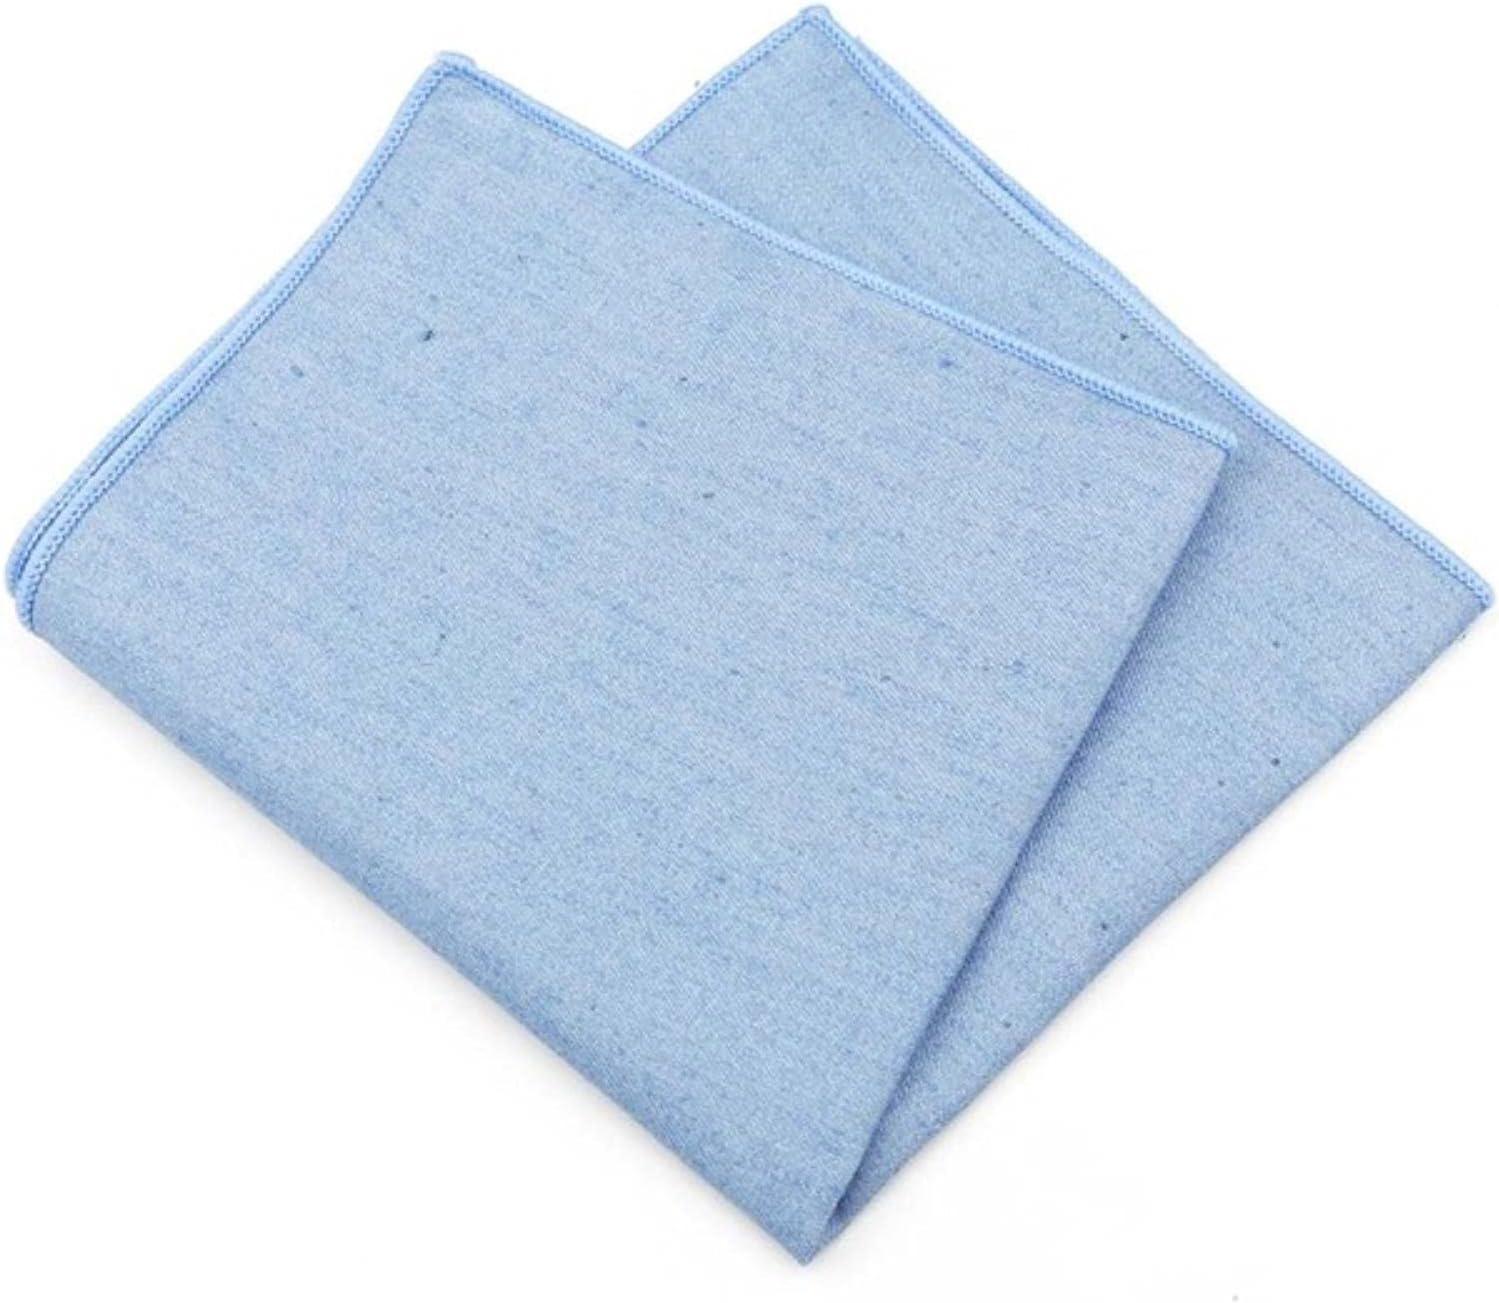 HJJACS Solid Denim Cotton Handkerchiefs Woven White Black Pocket Square Mens Casual Square Pockets Handkerchief Towels